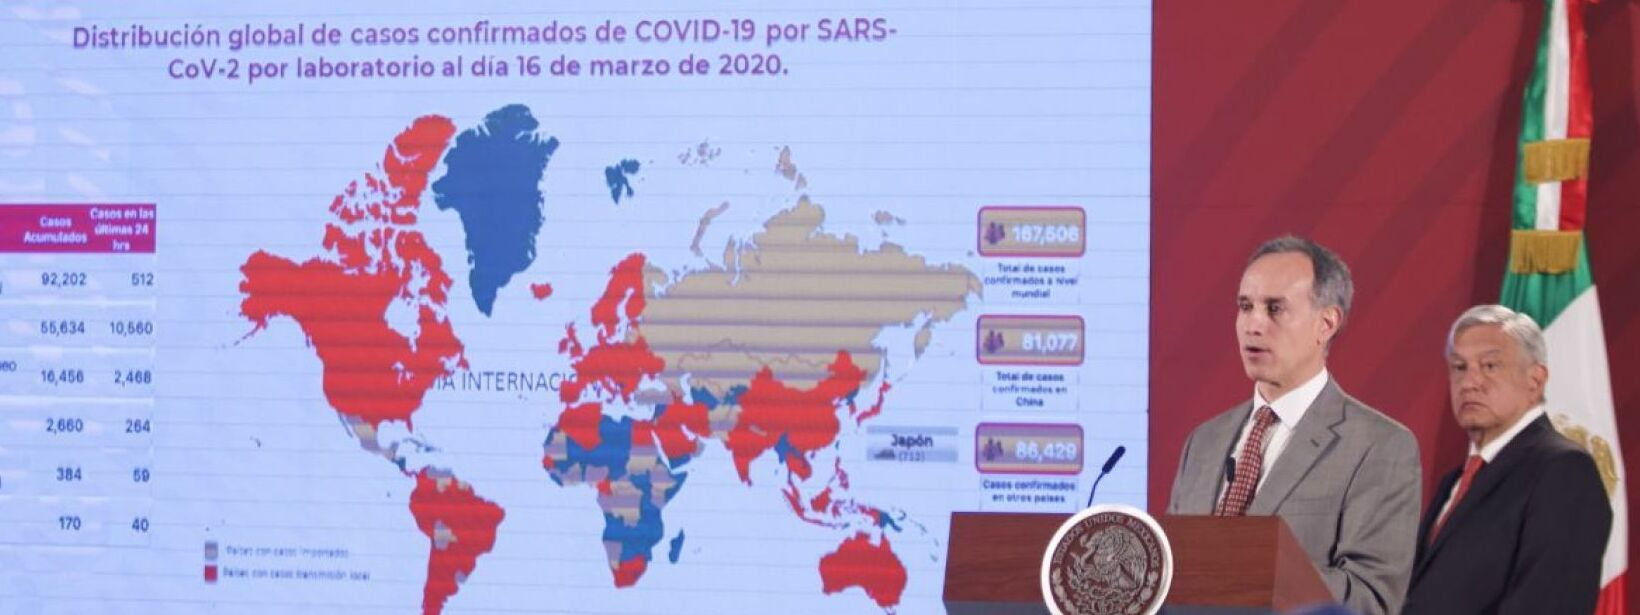 Gobierno Federal destinará 3,500 mdp para atender casos de Covid-19